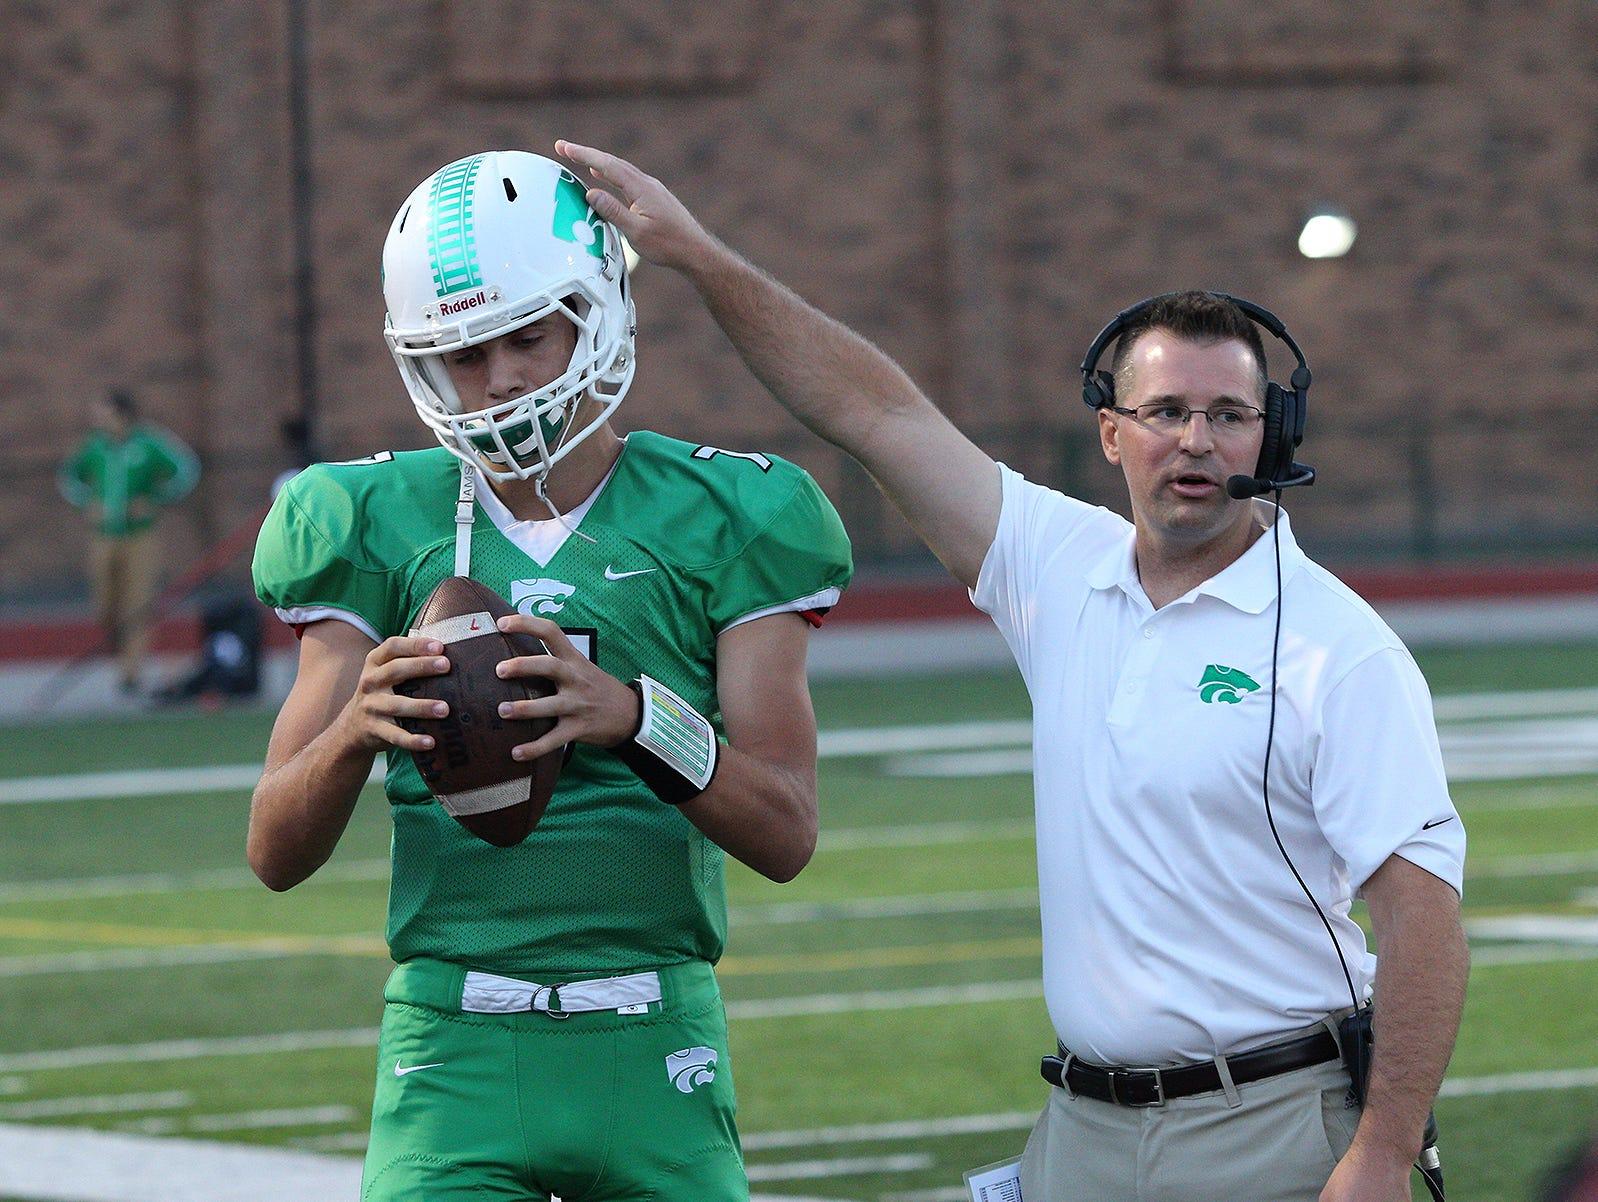 Novi quarterback Alec Bageris warms up alongside an assistant coach before the Novi-Plymouth Salem football game Oct. 7, 2016 at Novi High School.